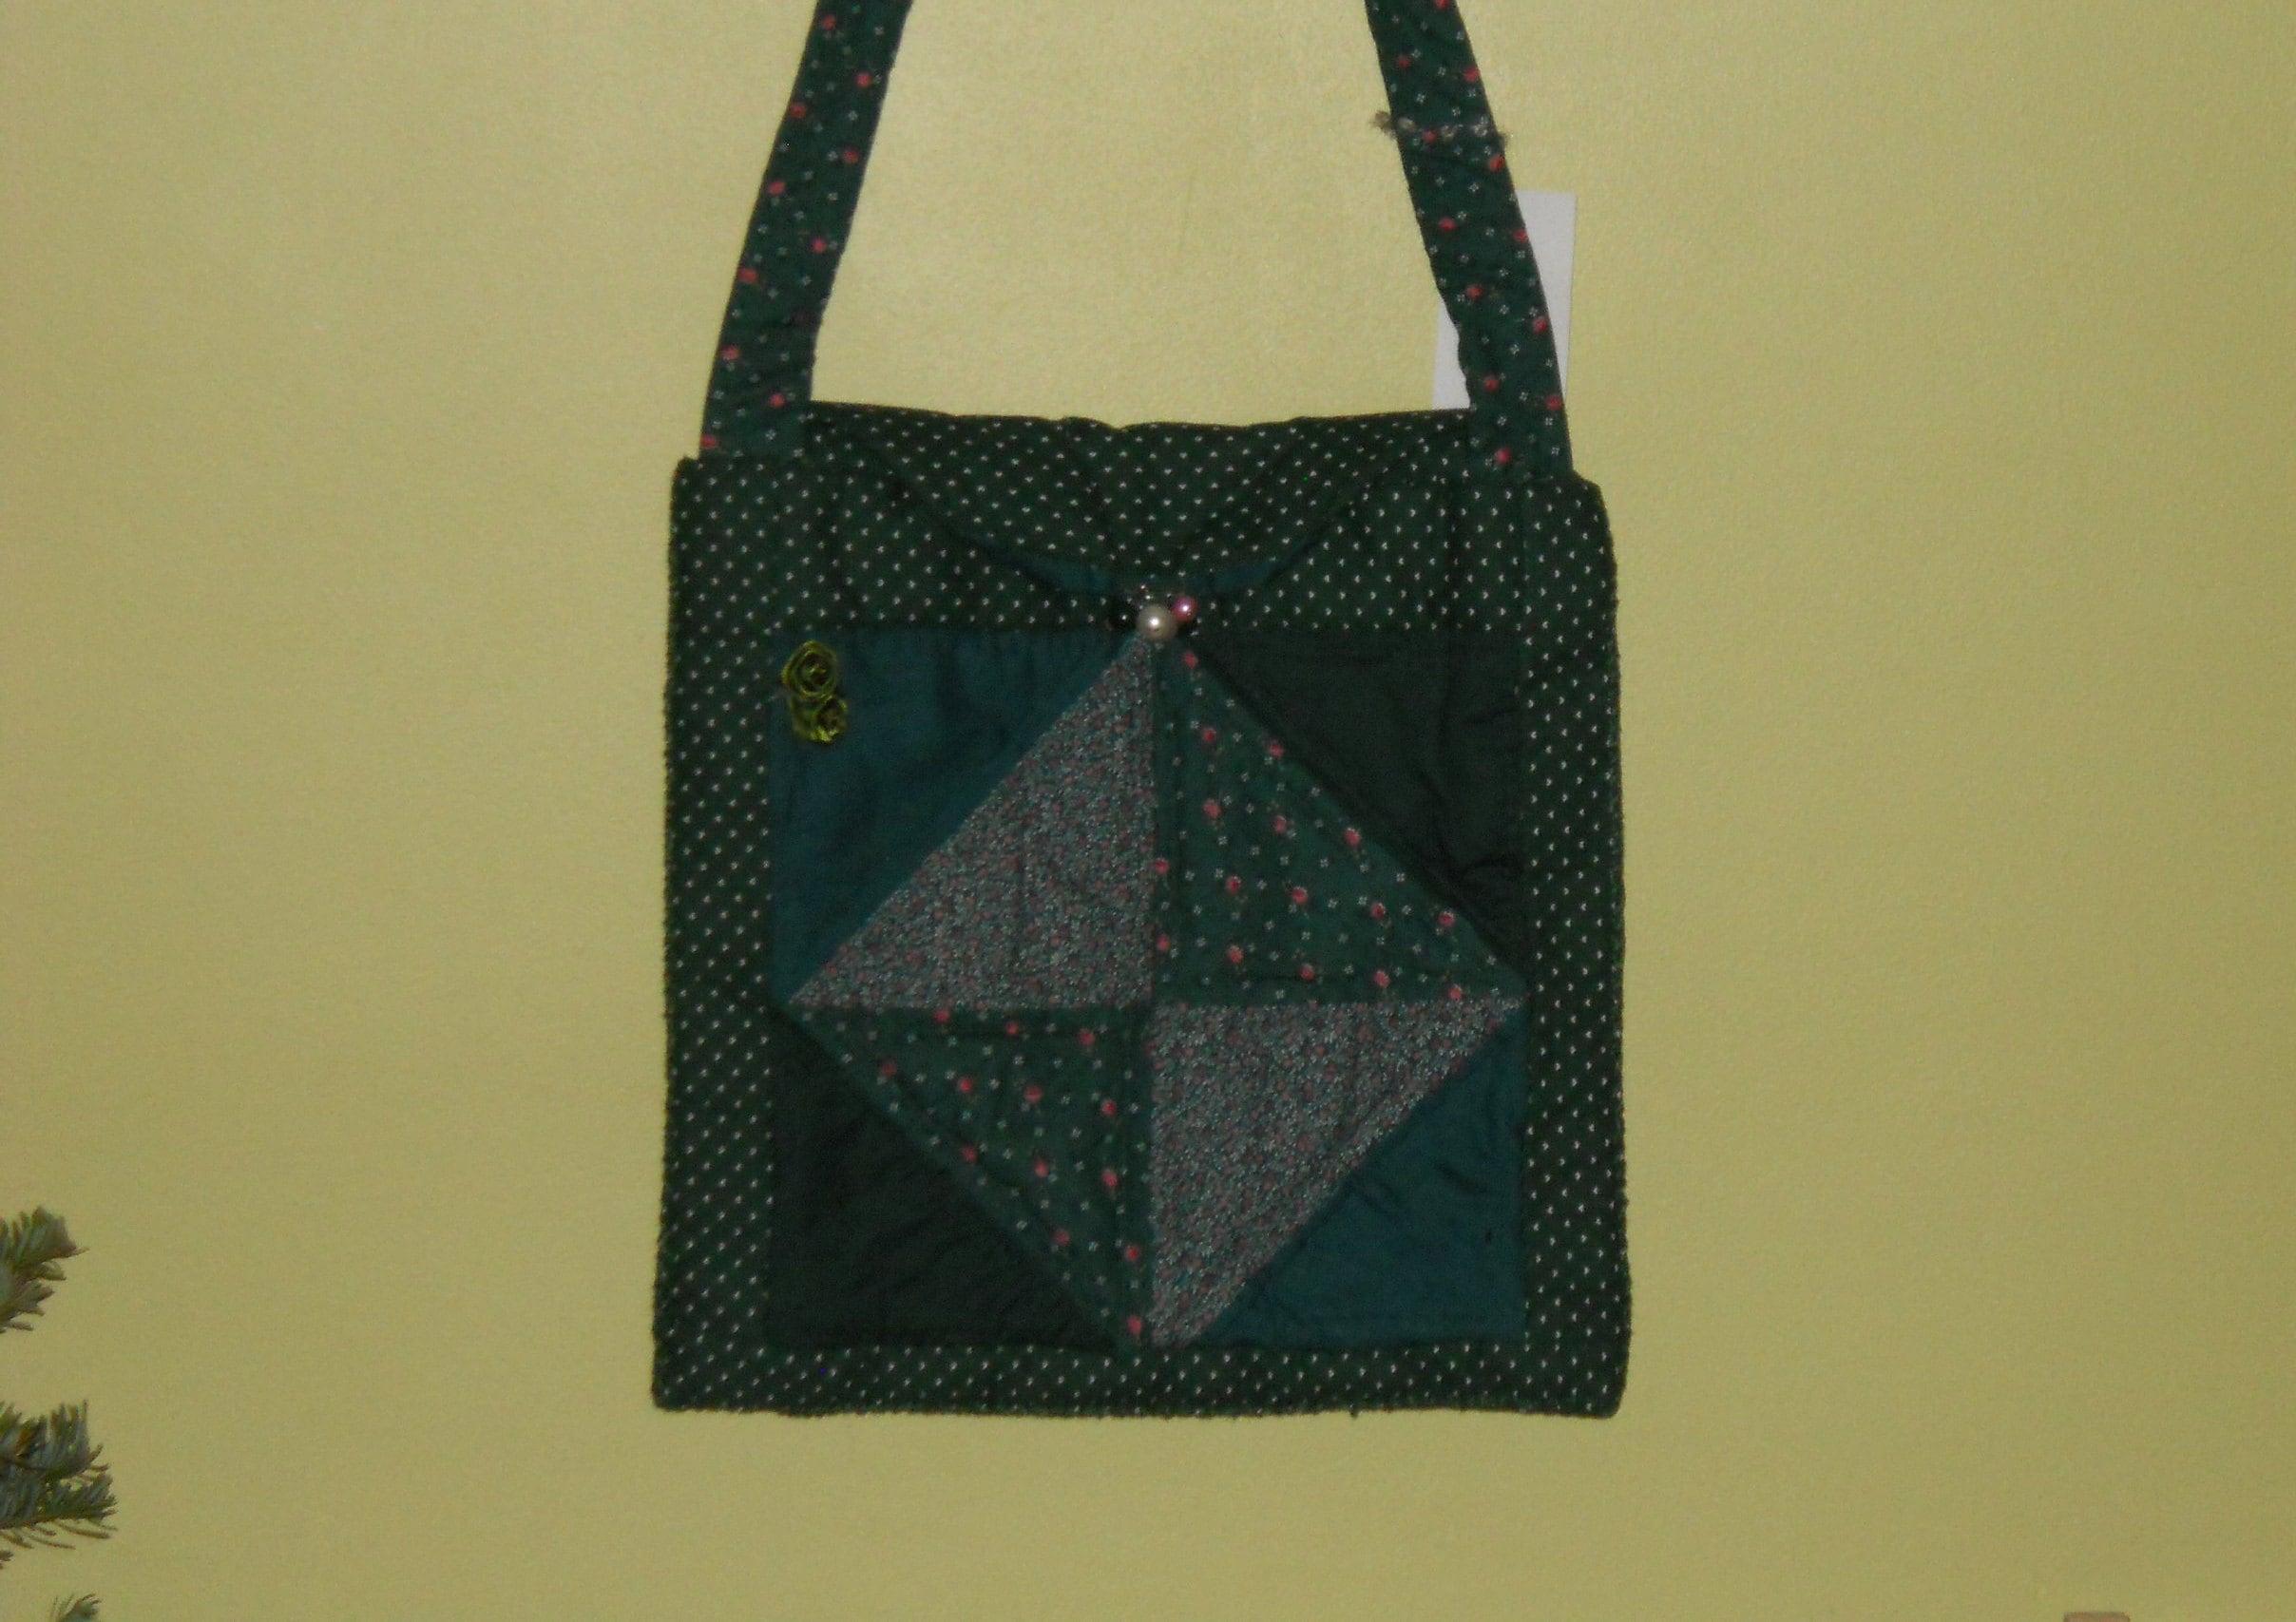 df7121817e Green quilted bag purse  handwork bag